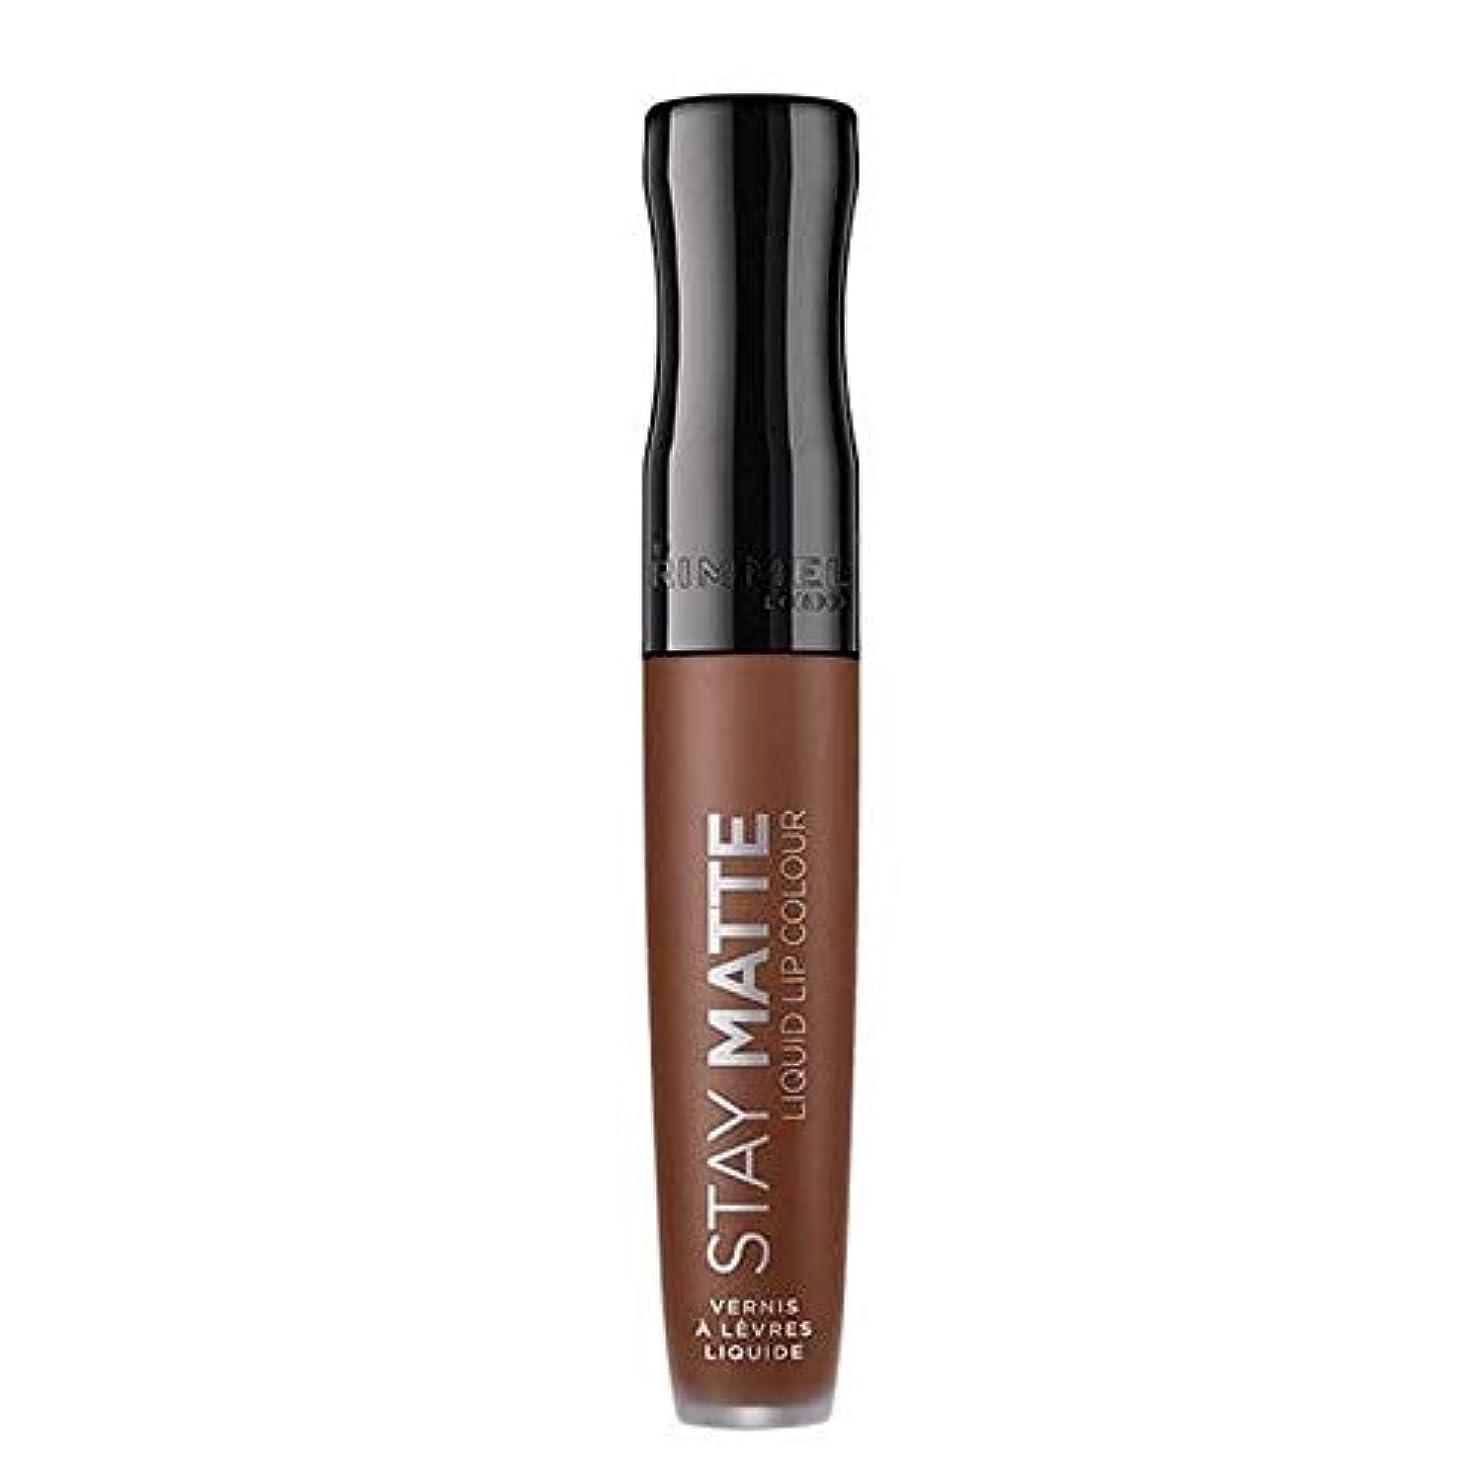 [Rimmel ] スキャンダラスリンメルステイマット液体リップ口紅 - Rimmel Stay Matte Liquid Lip Lipstick Scandalous [並行輸入品]